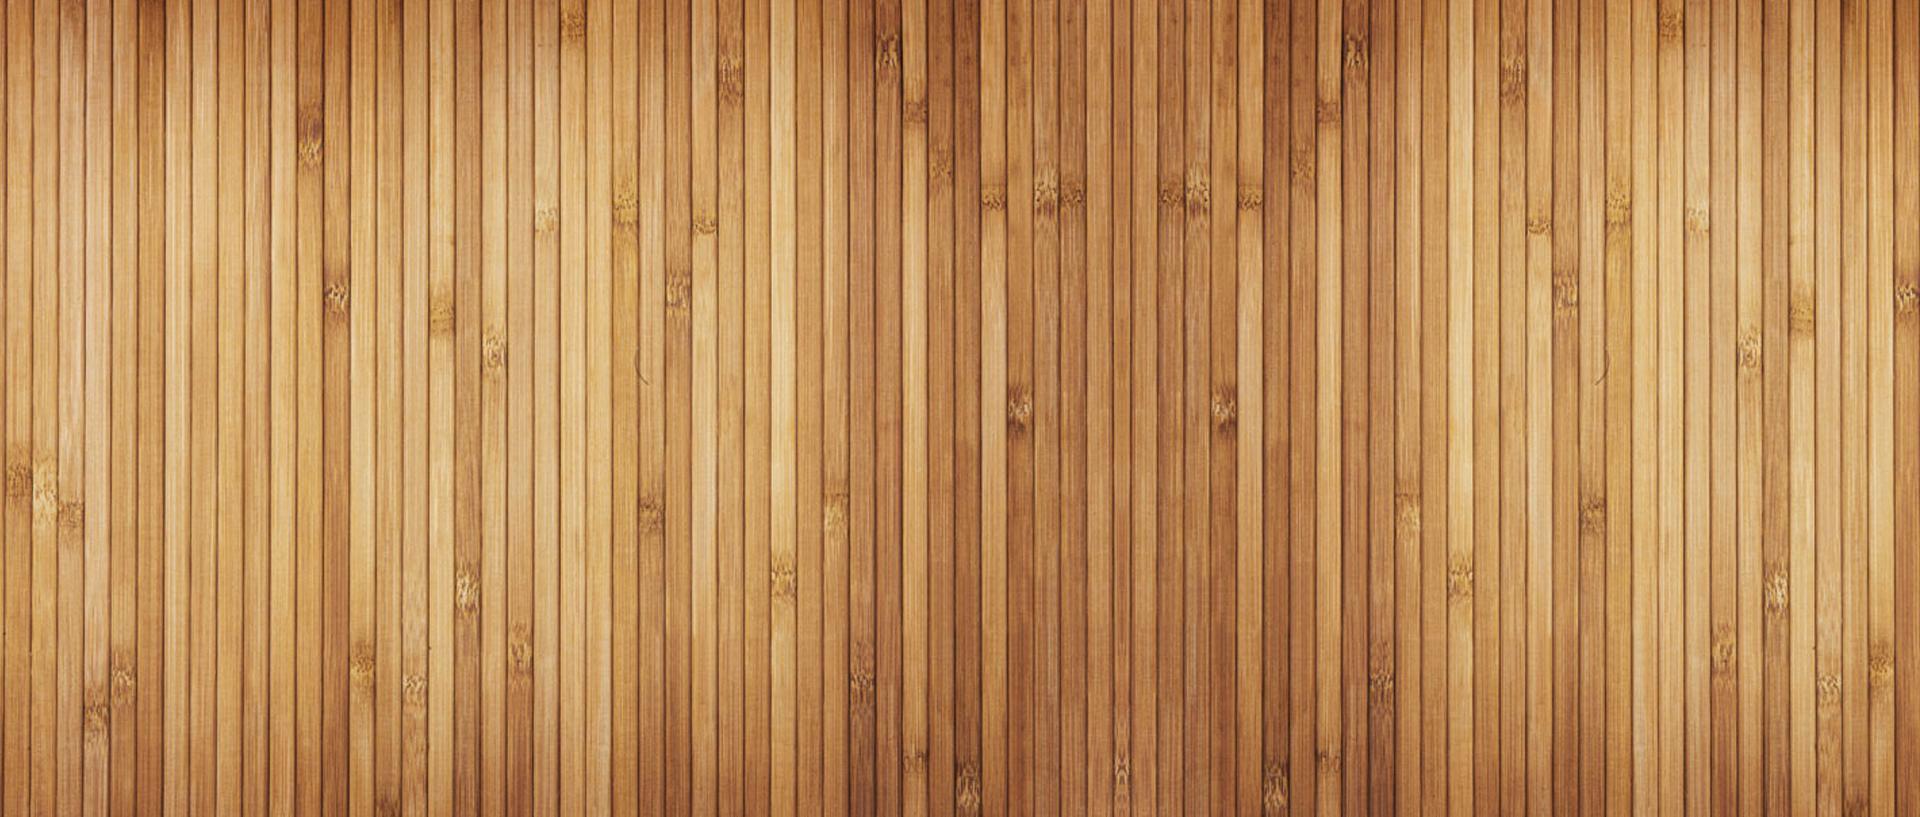 Painel Pine Textura Material Background Parede De Madeira